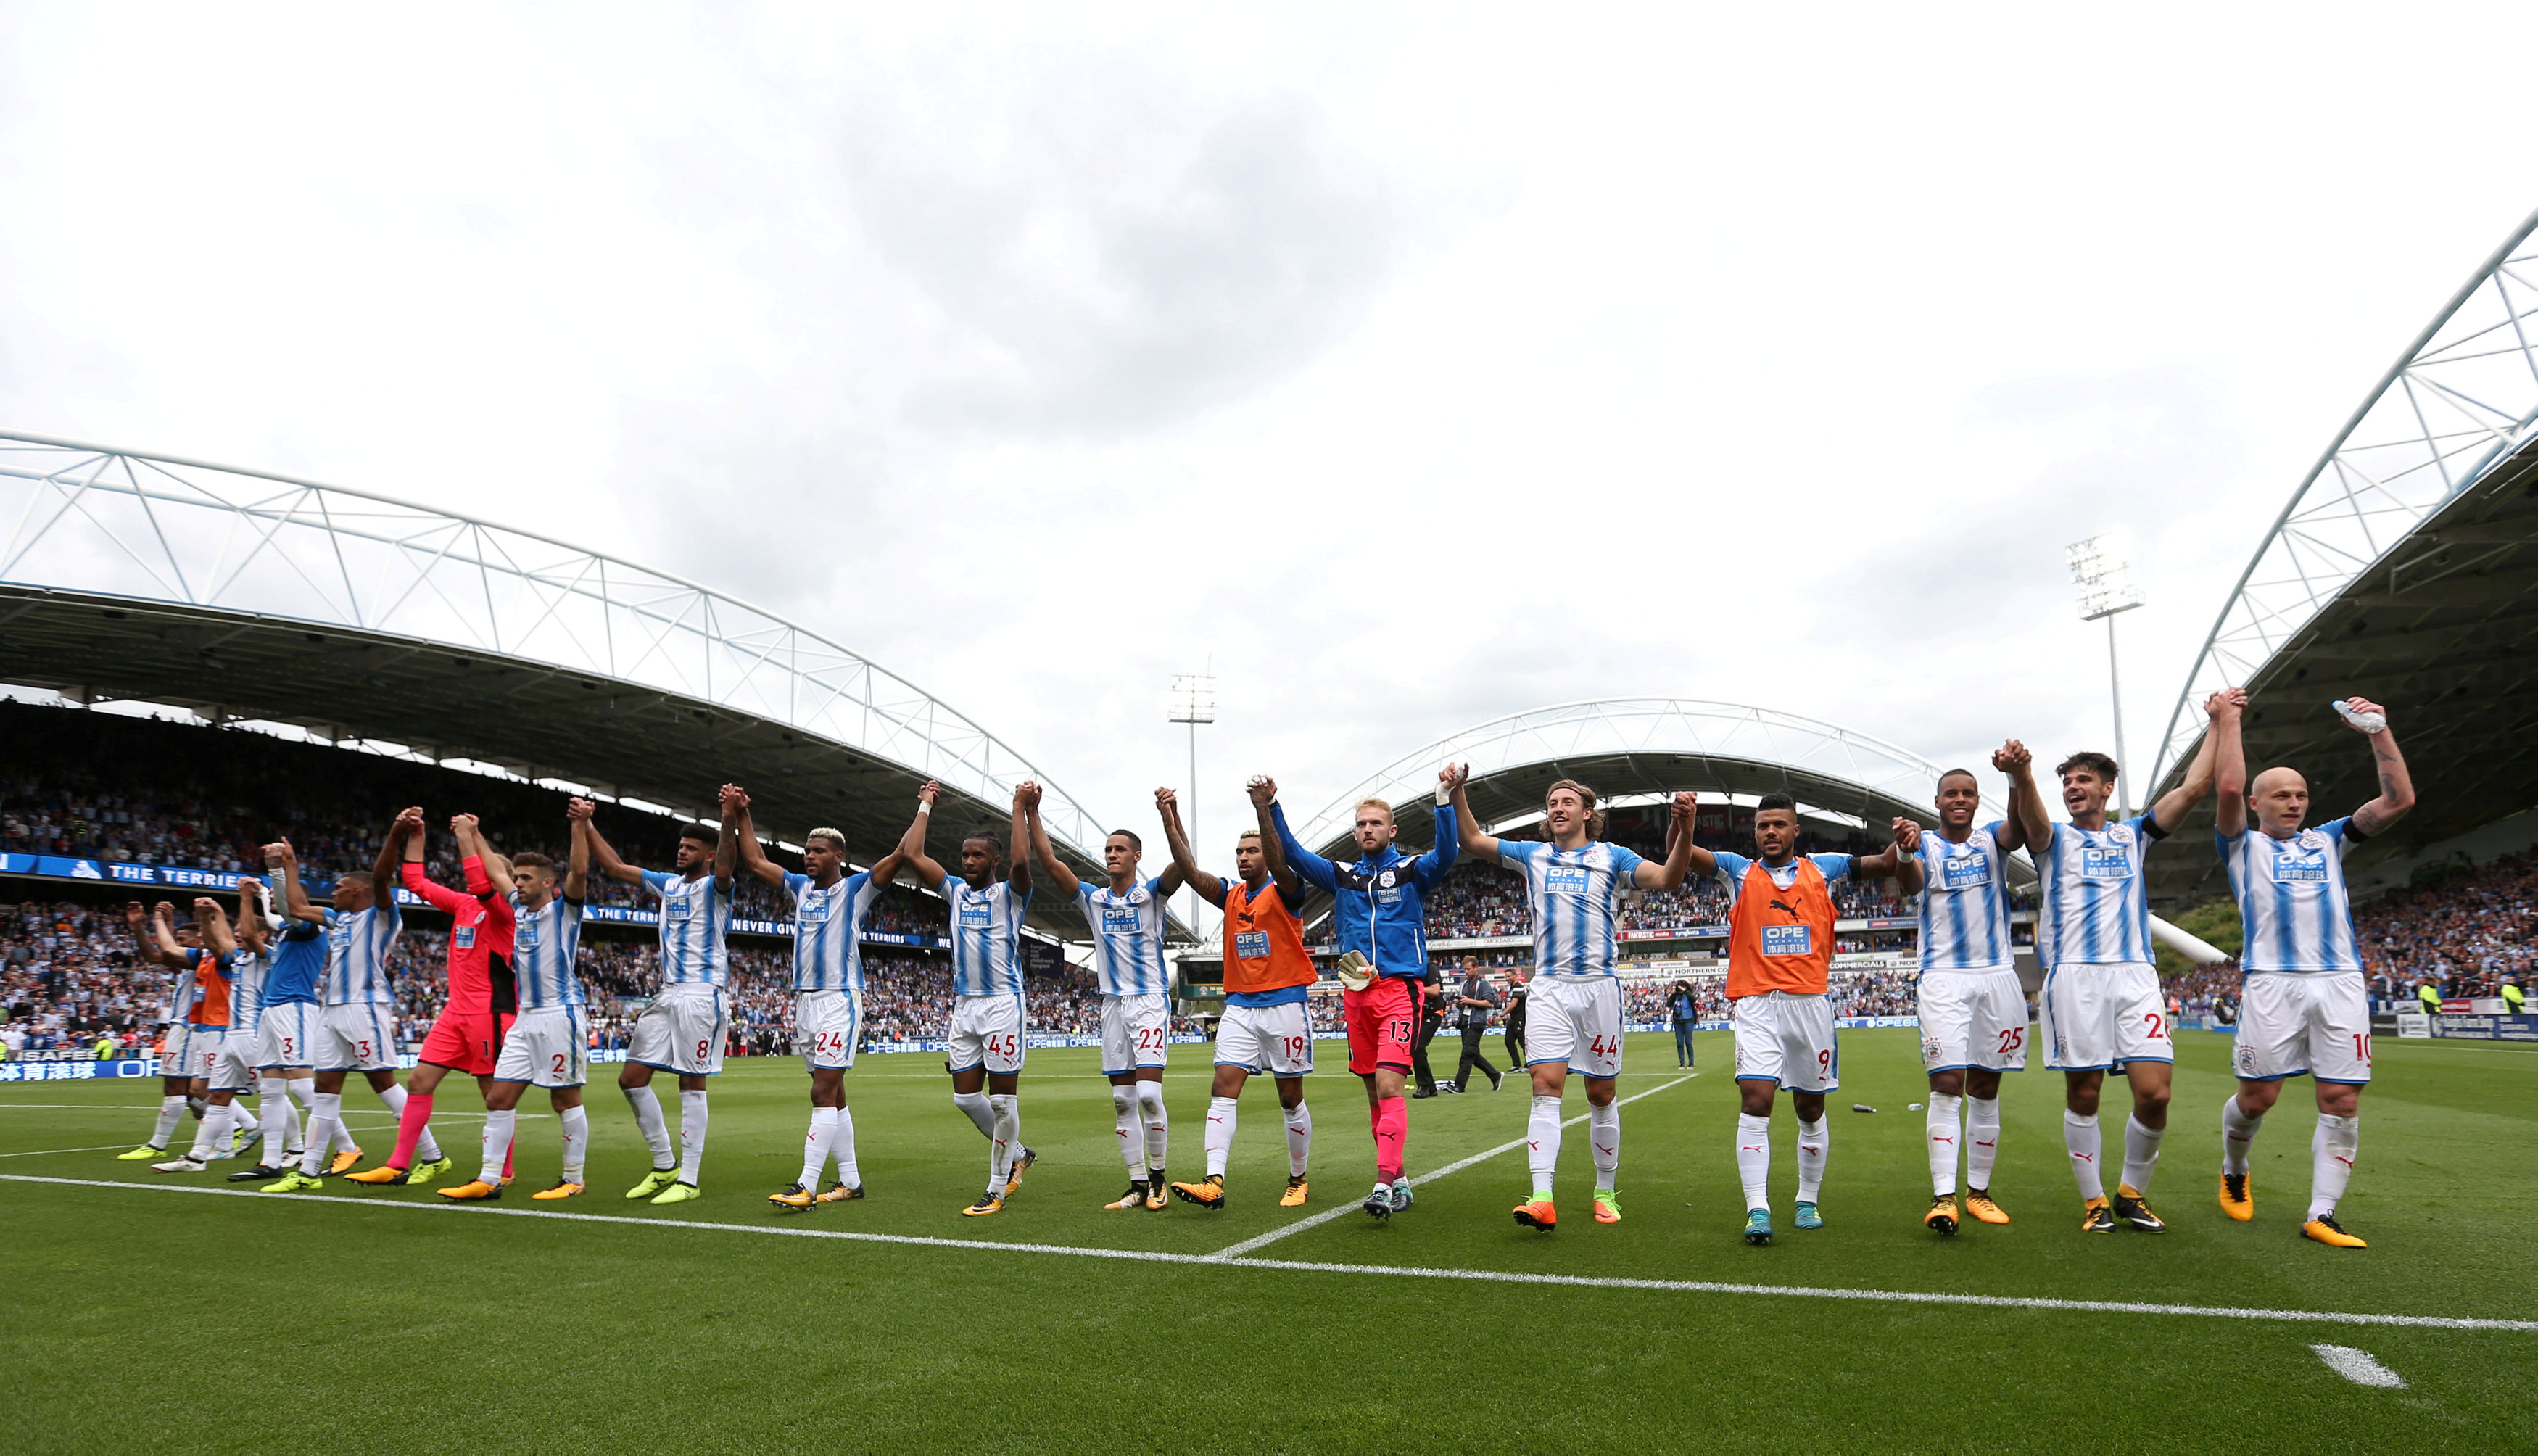 Huddersfield players